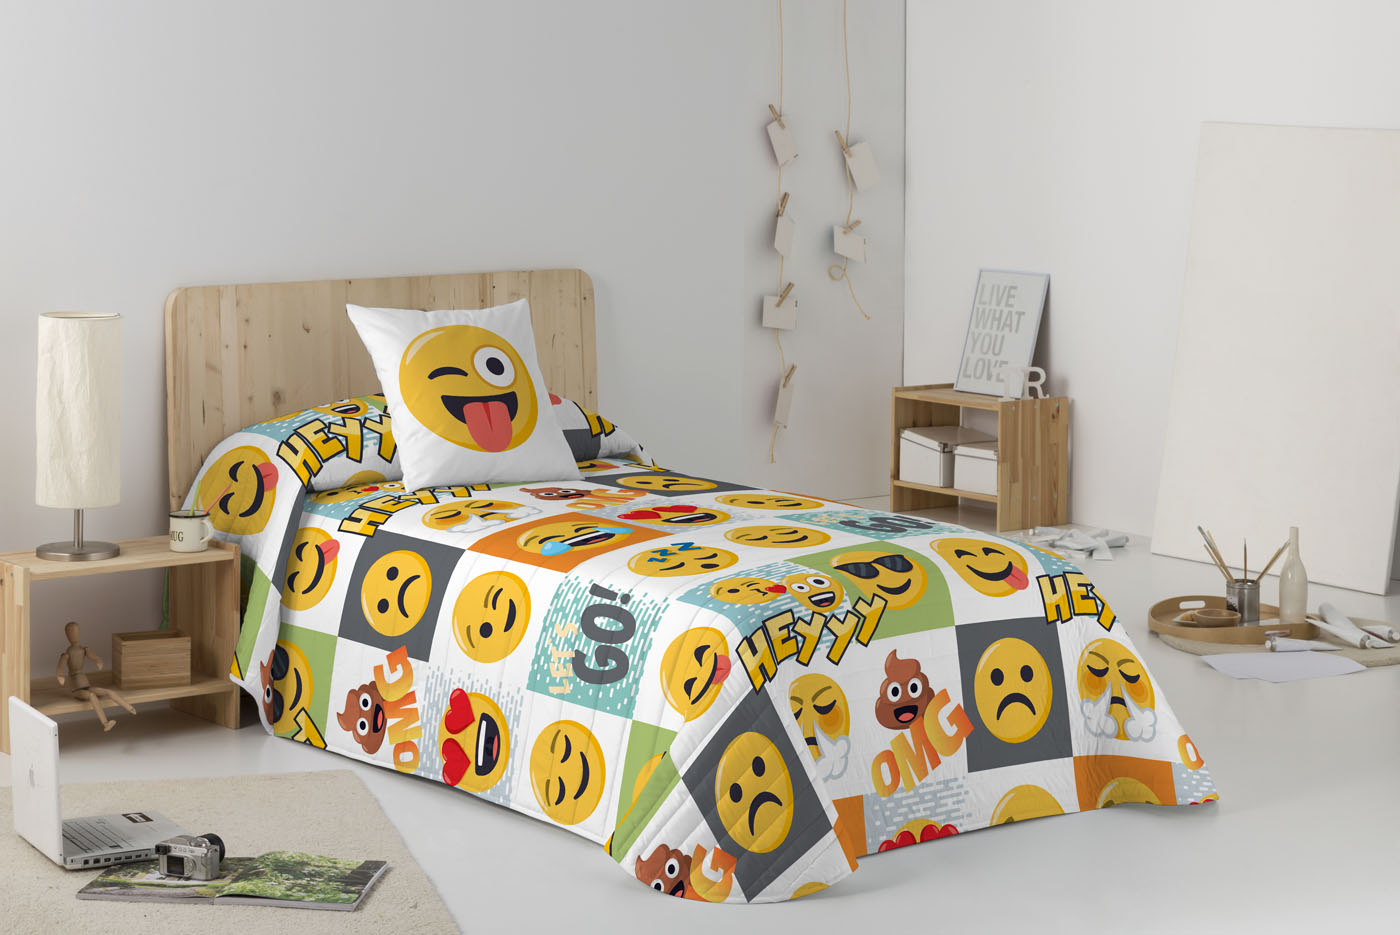 COLCHA BOUTI HEY  de JOY PIXELS EmojiOne